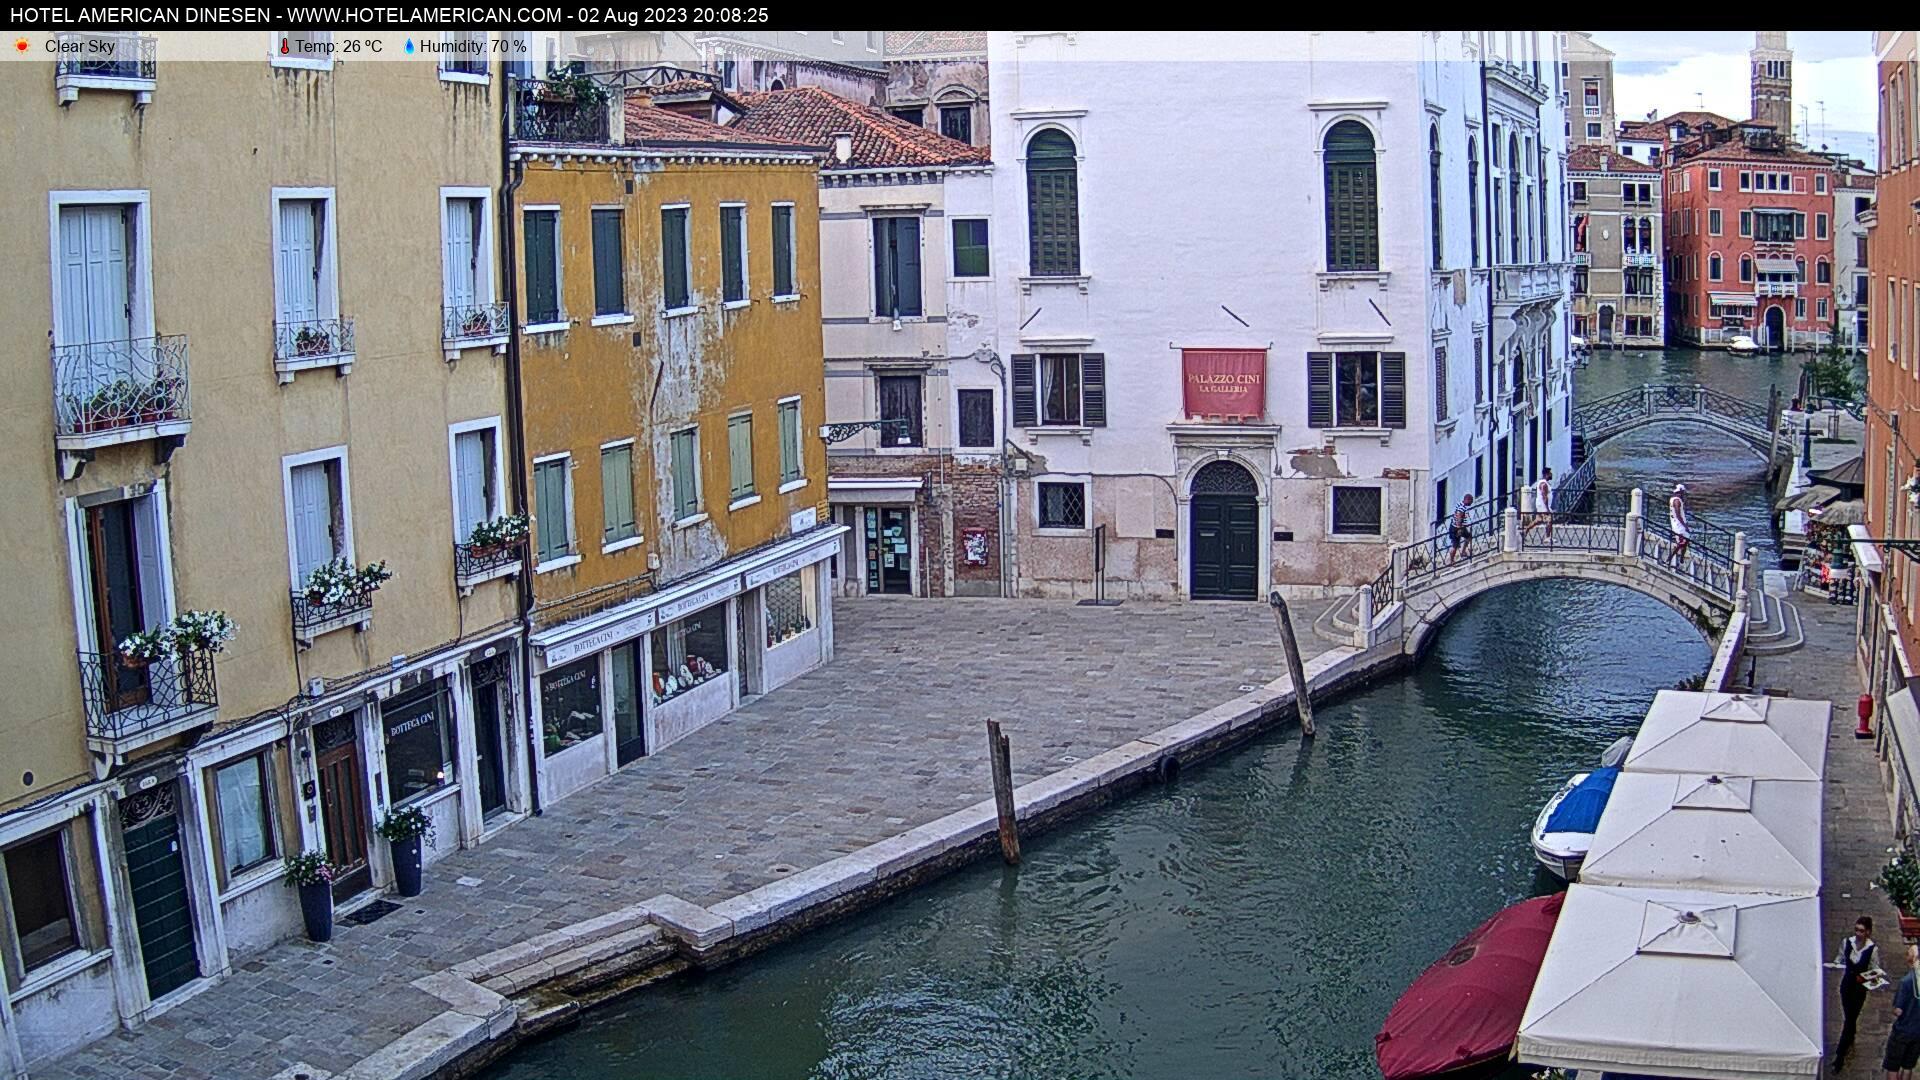 Venedig Sa. 20:08